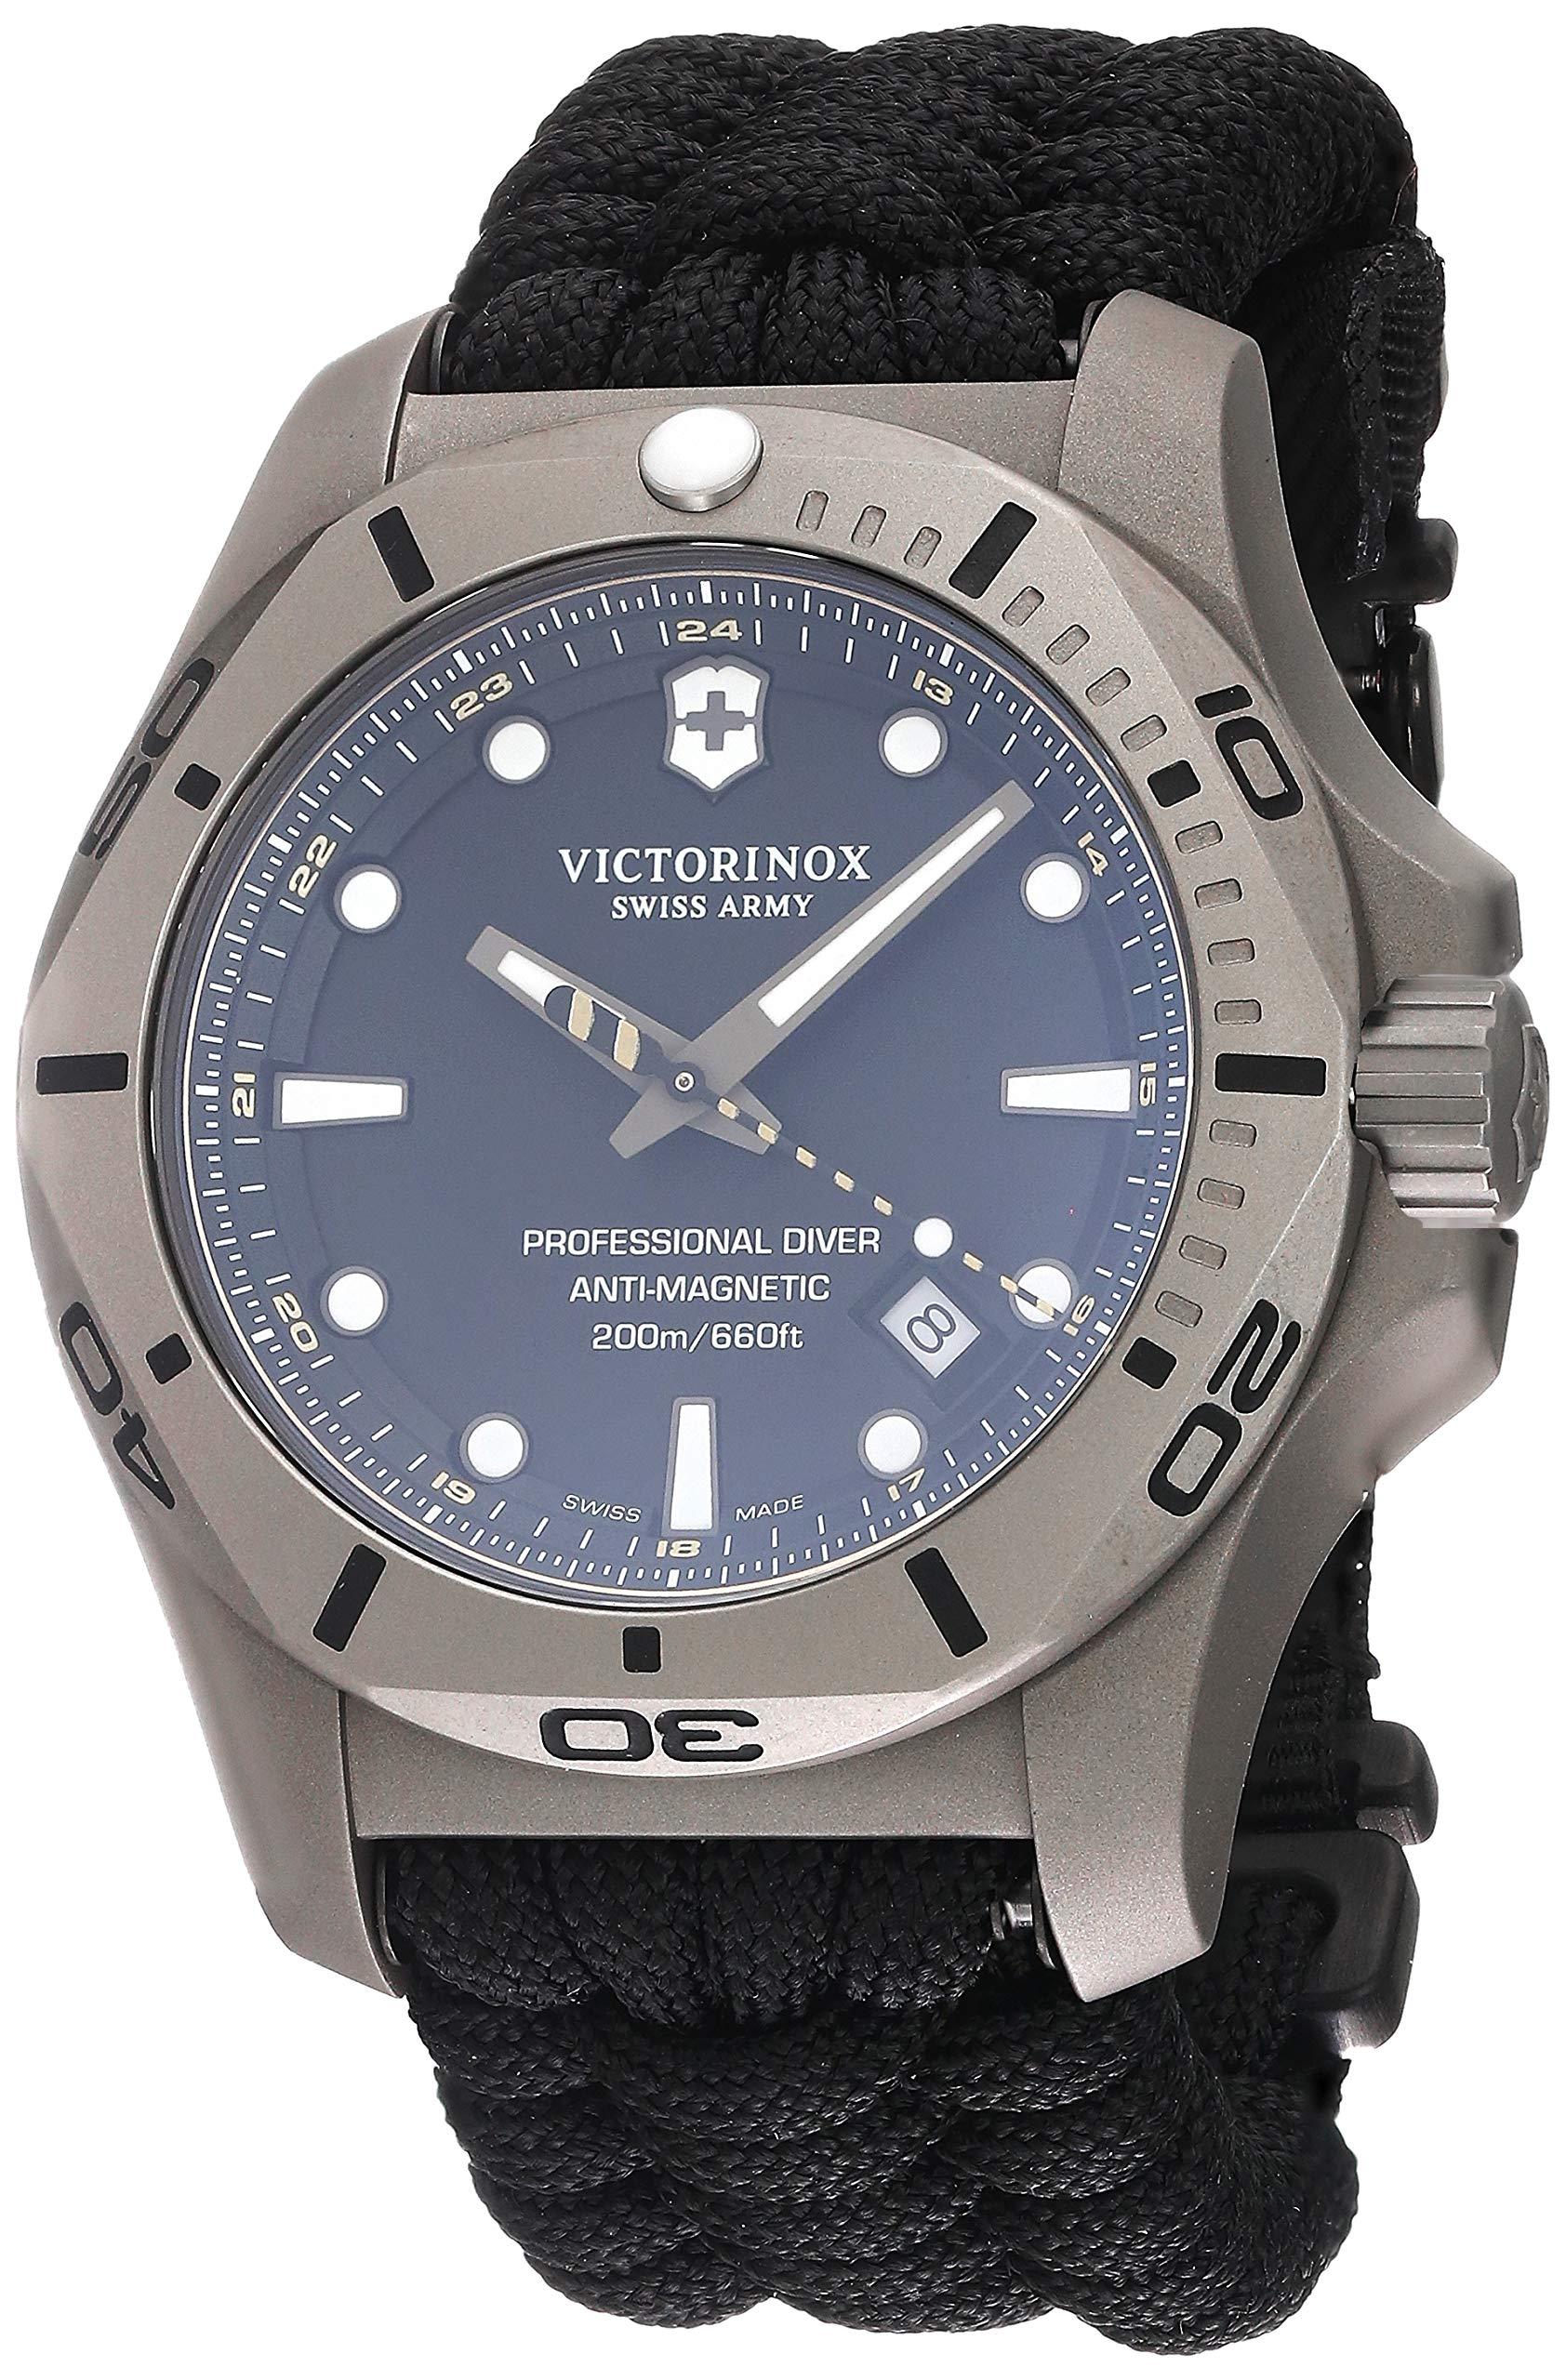 Victorinox Men's I.N.O.X. Professional Diver Titanium – Swiss Made Analog Quartz Titanium/Paracord Watch 241812